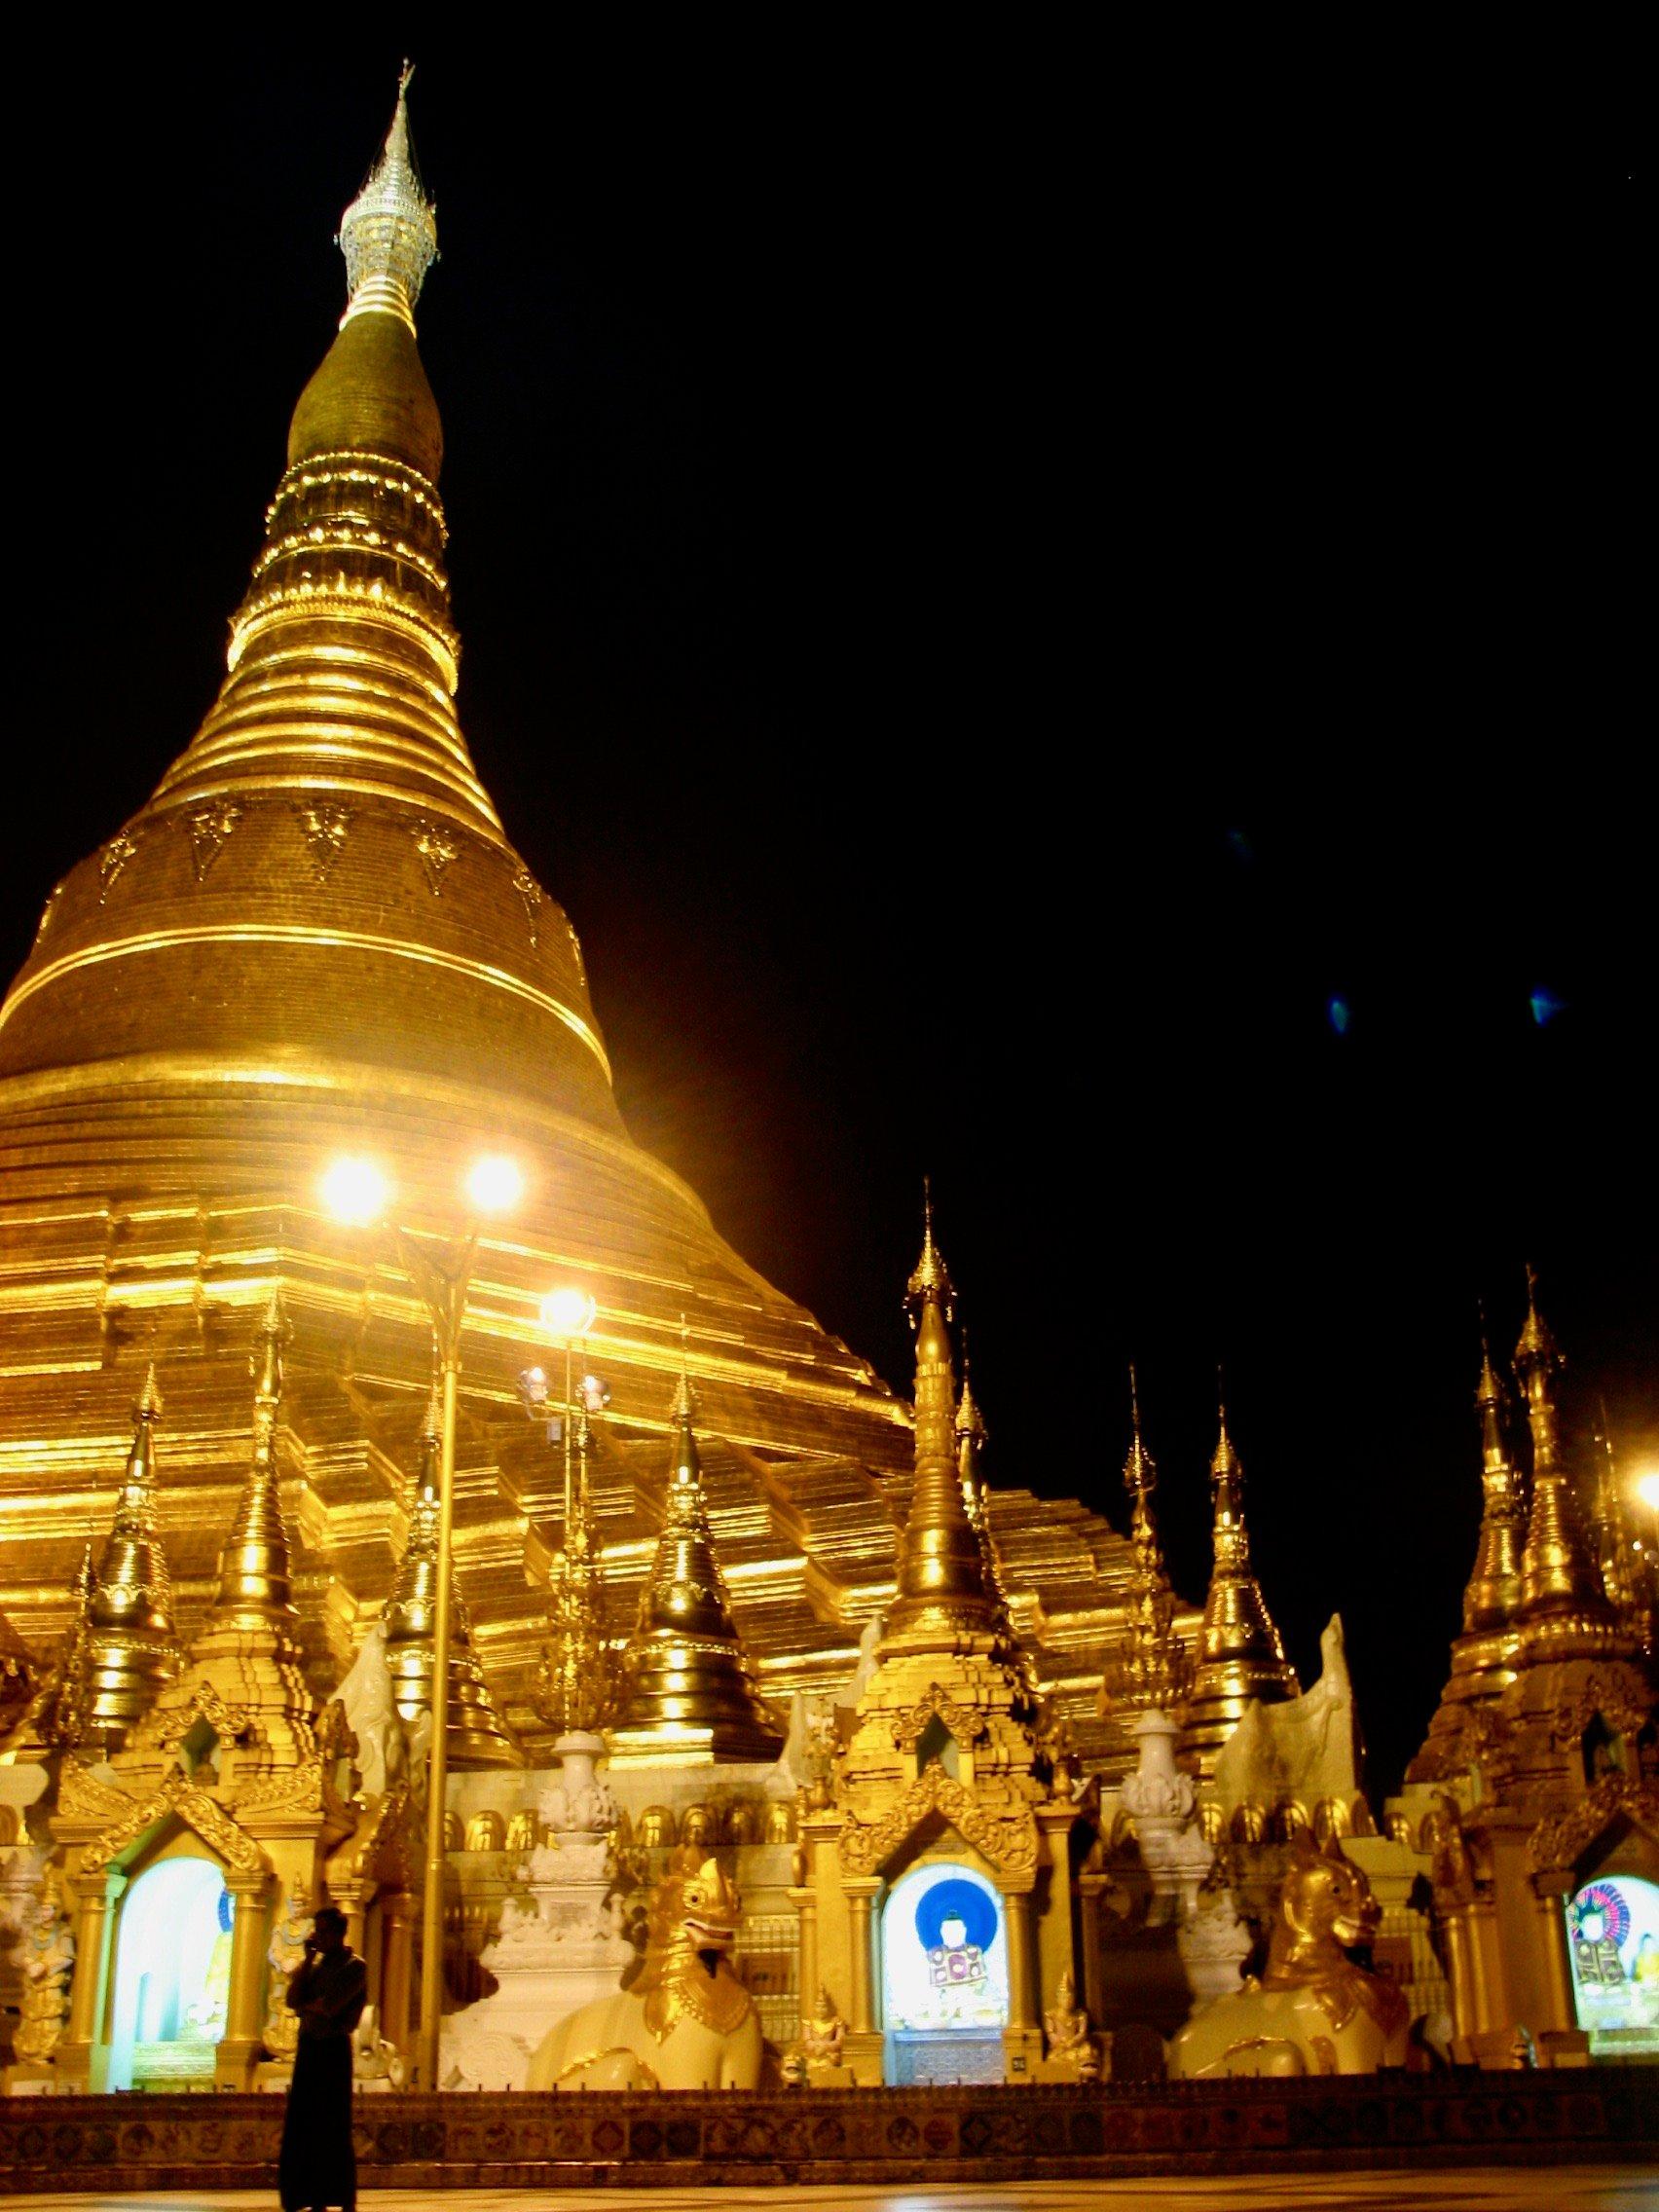 Myanmar Temples_Image#4